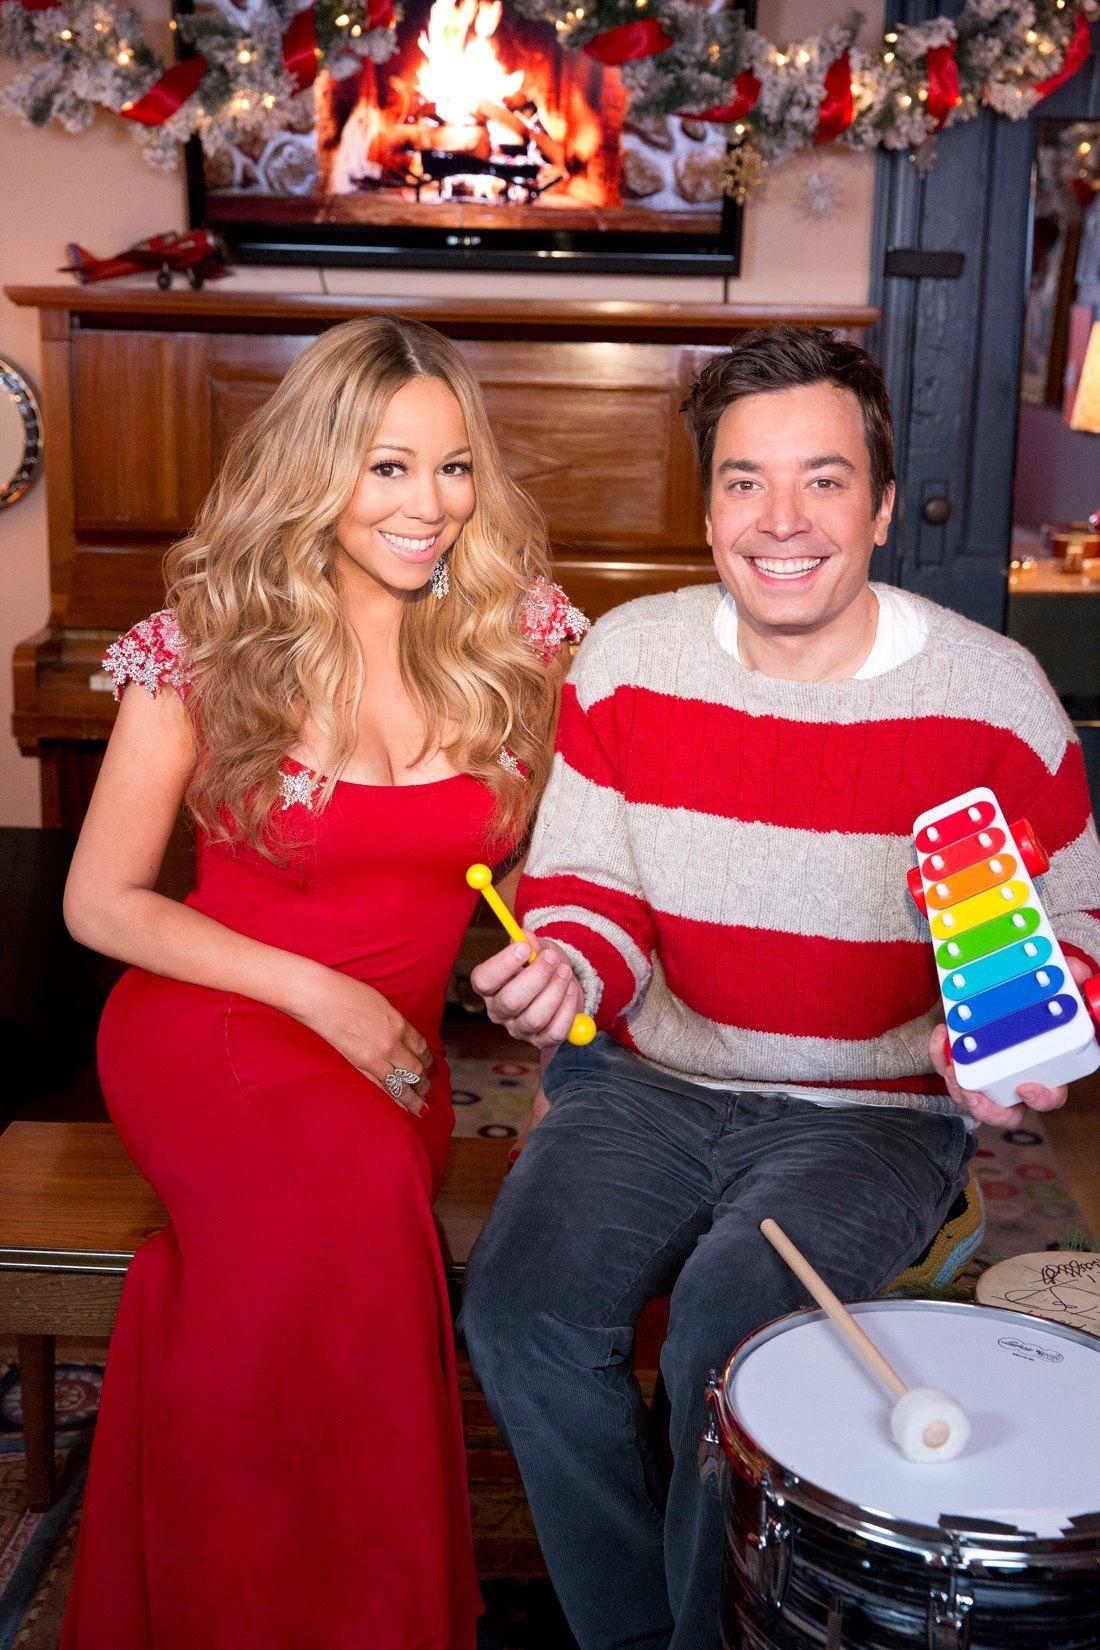 Mariah Carey and Jimmy Fallon celebrating the Christmas Season ...